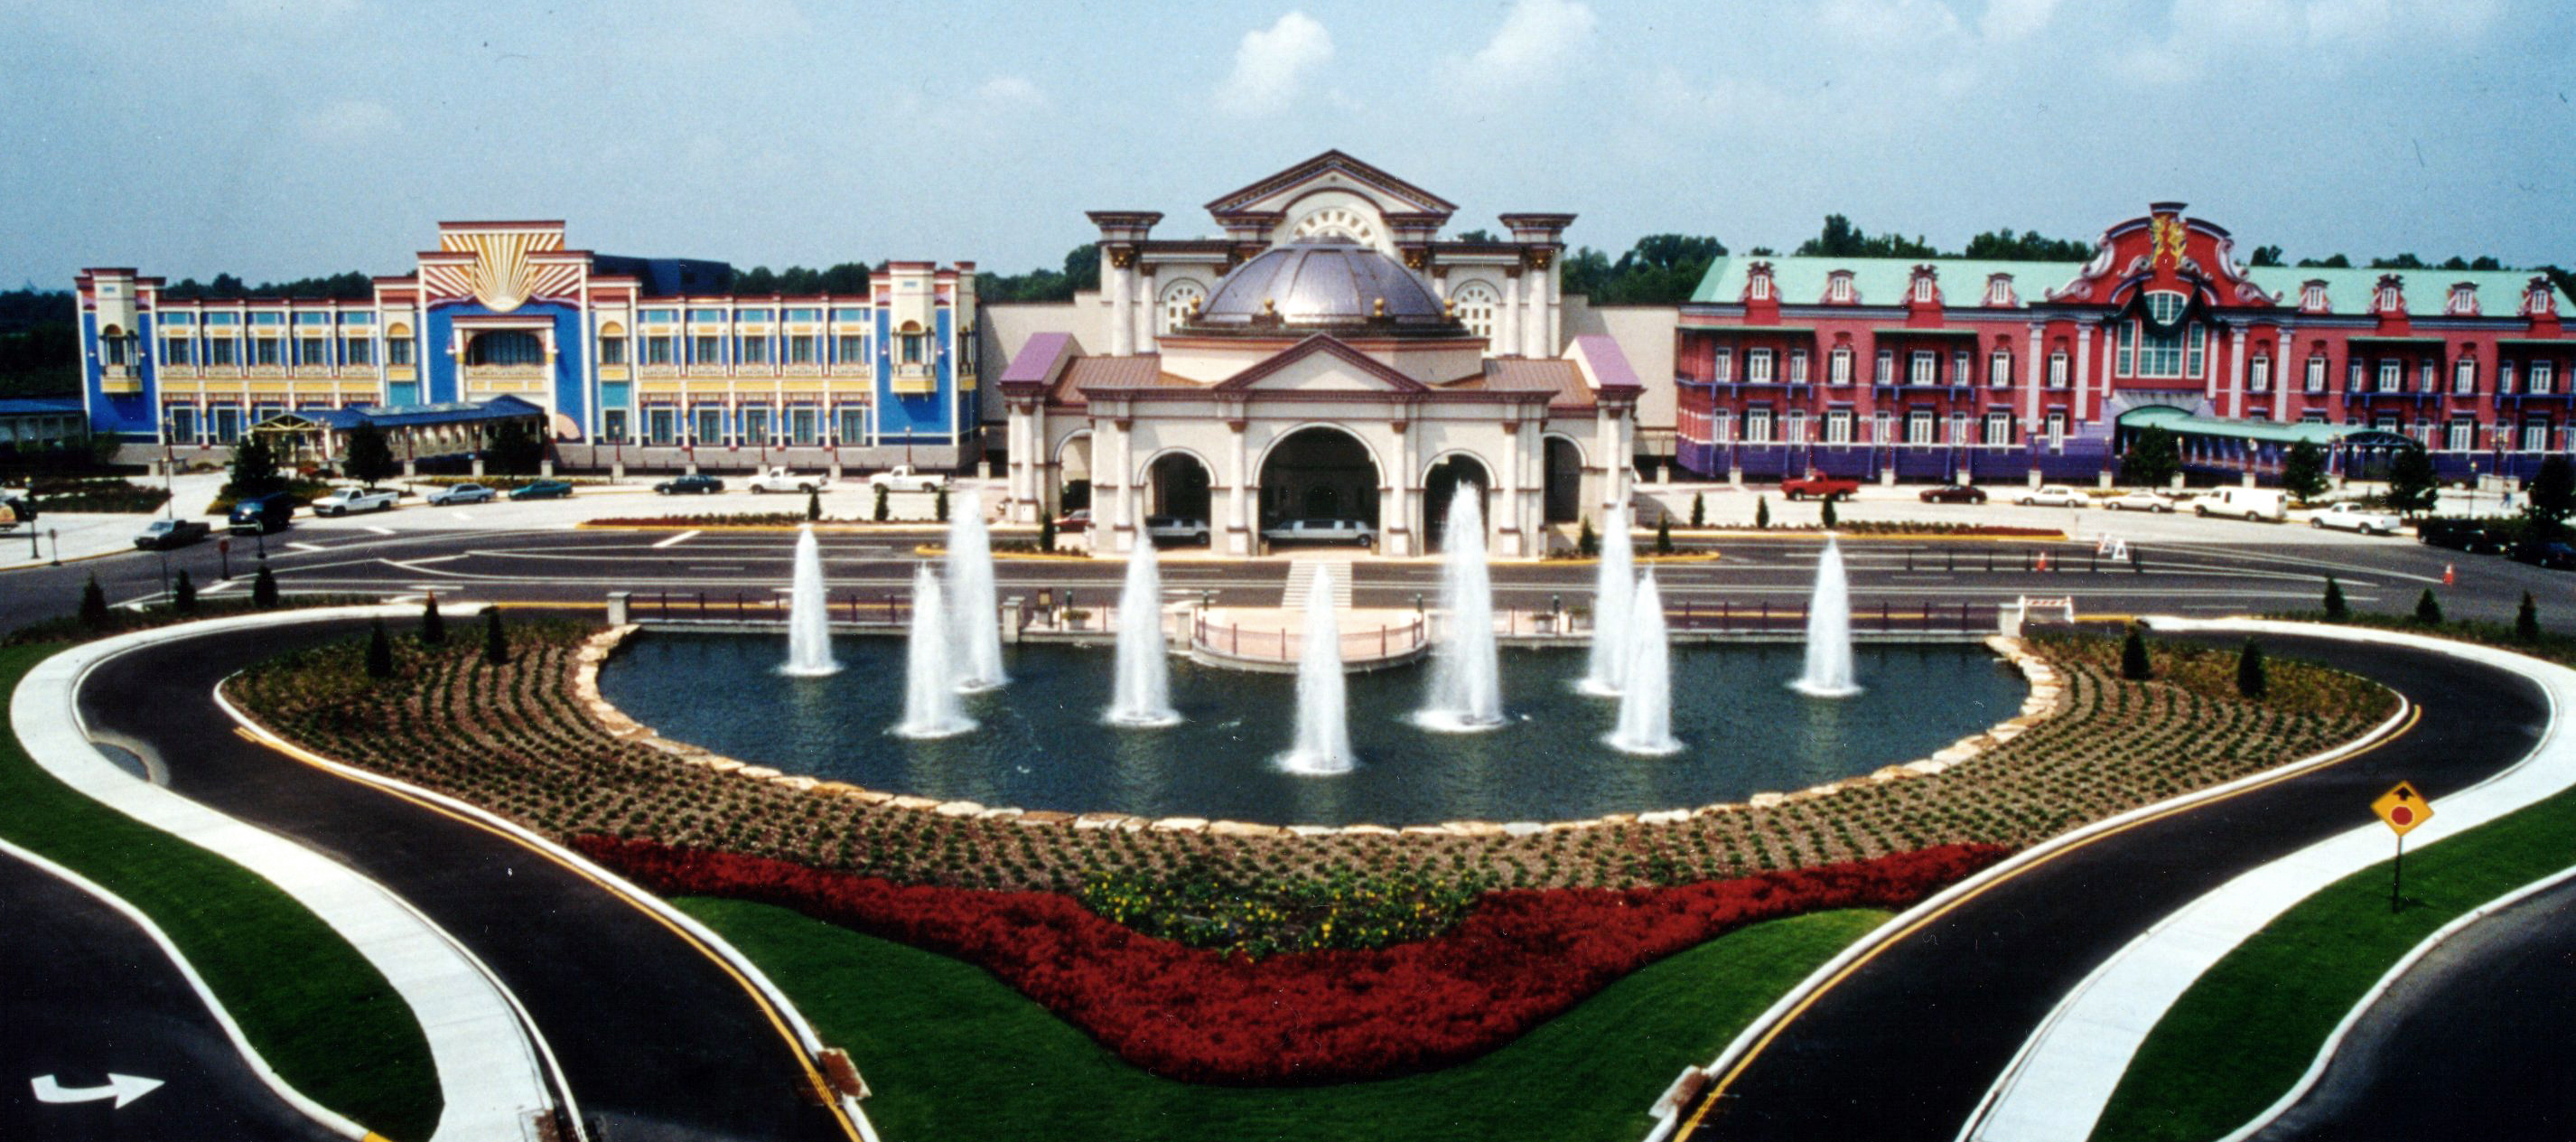 Ballys casino hotel tunica ms